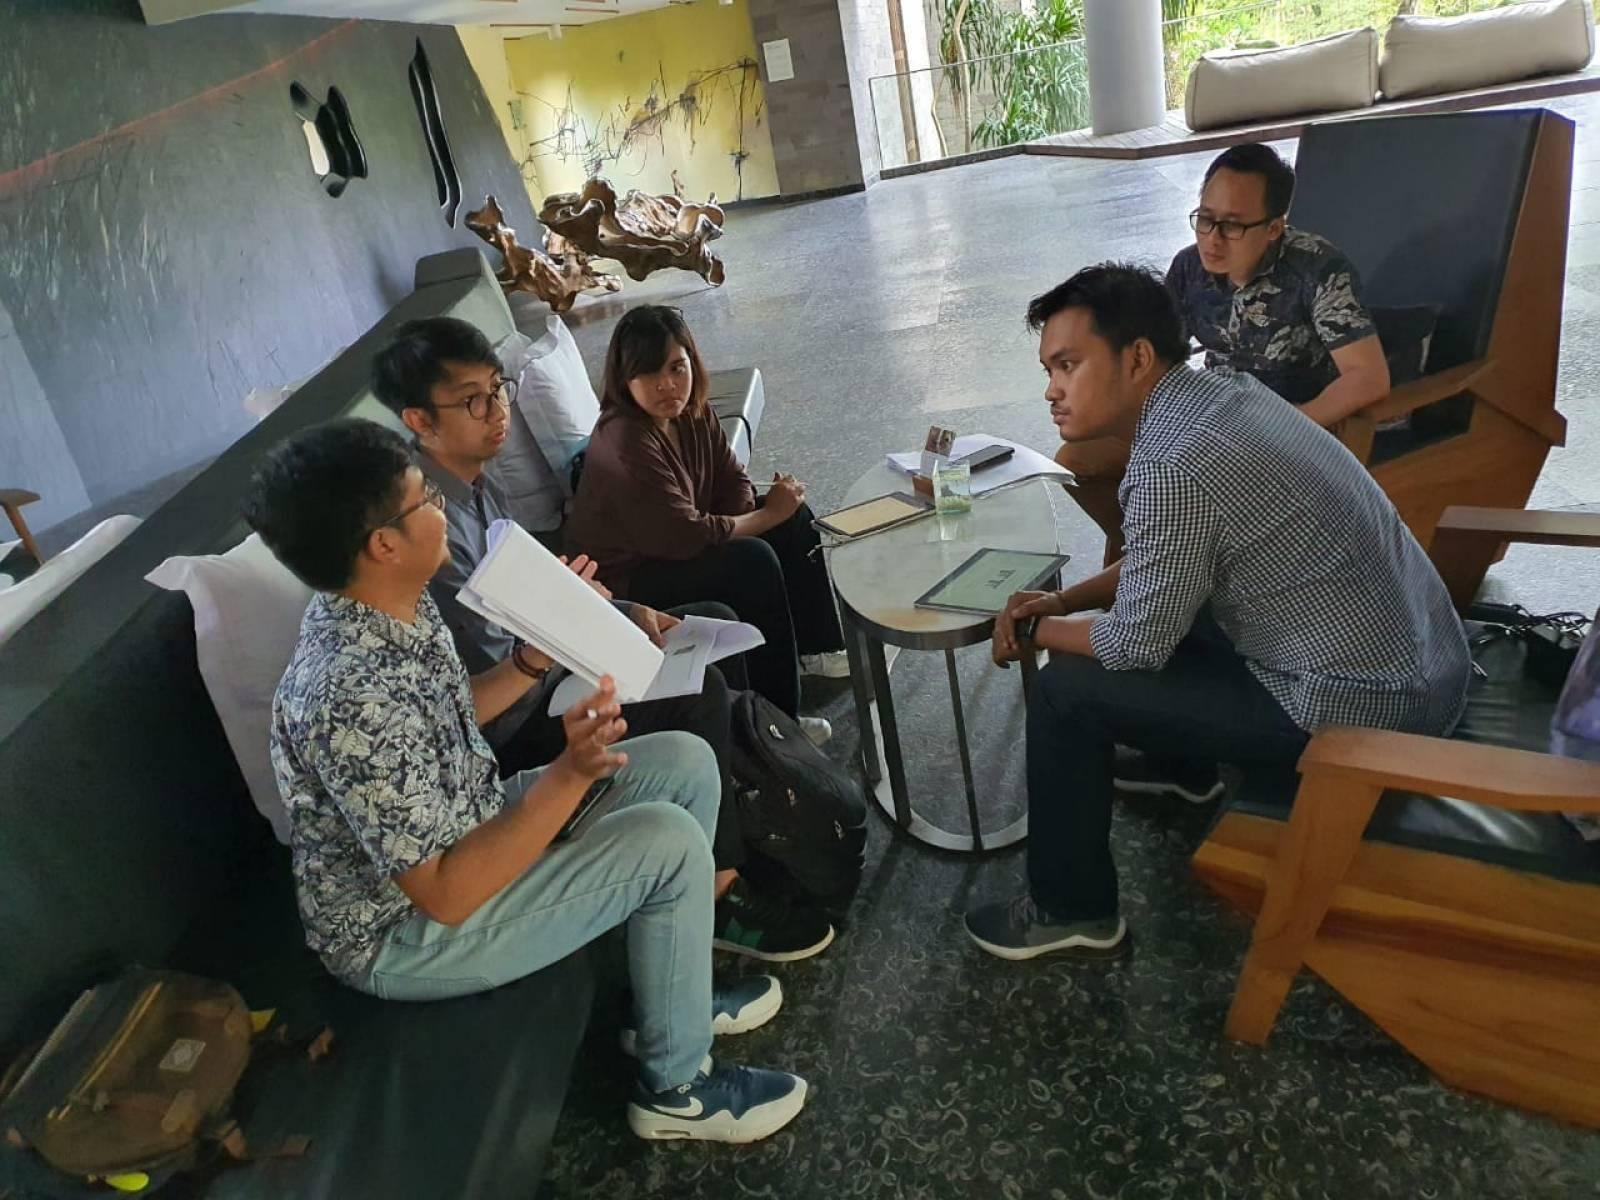 Meeting with the Emporio Architect Jogja Team at Maya Sanur Resort & Spa, Bali 6